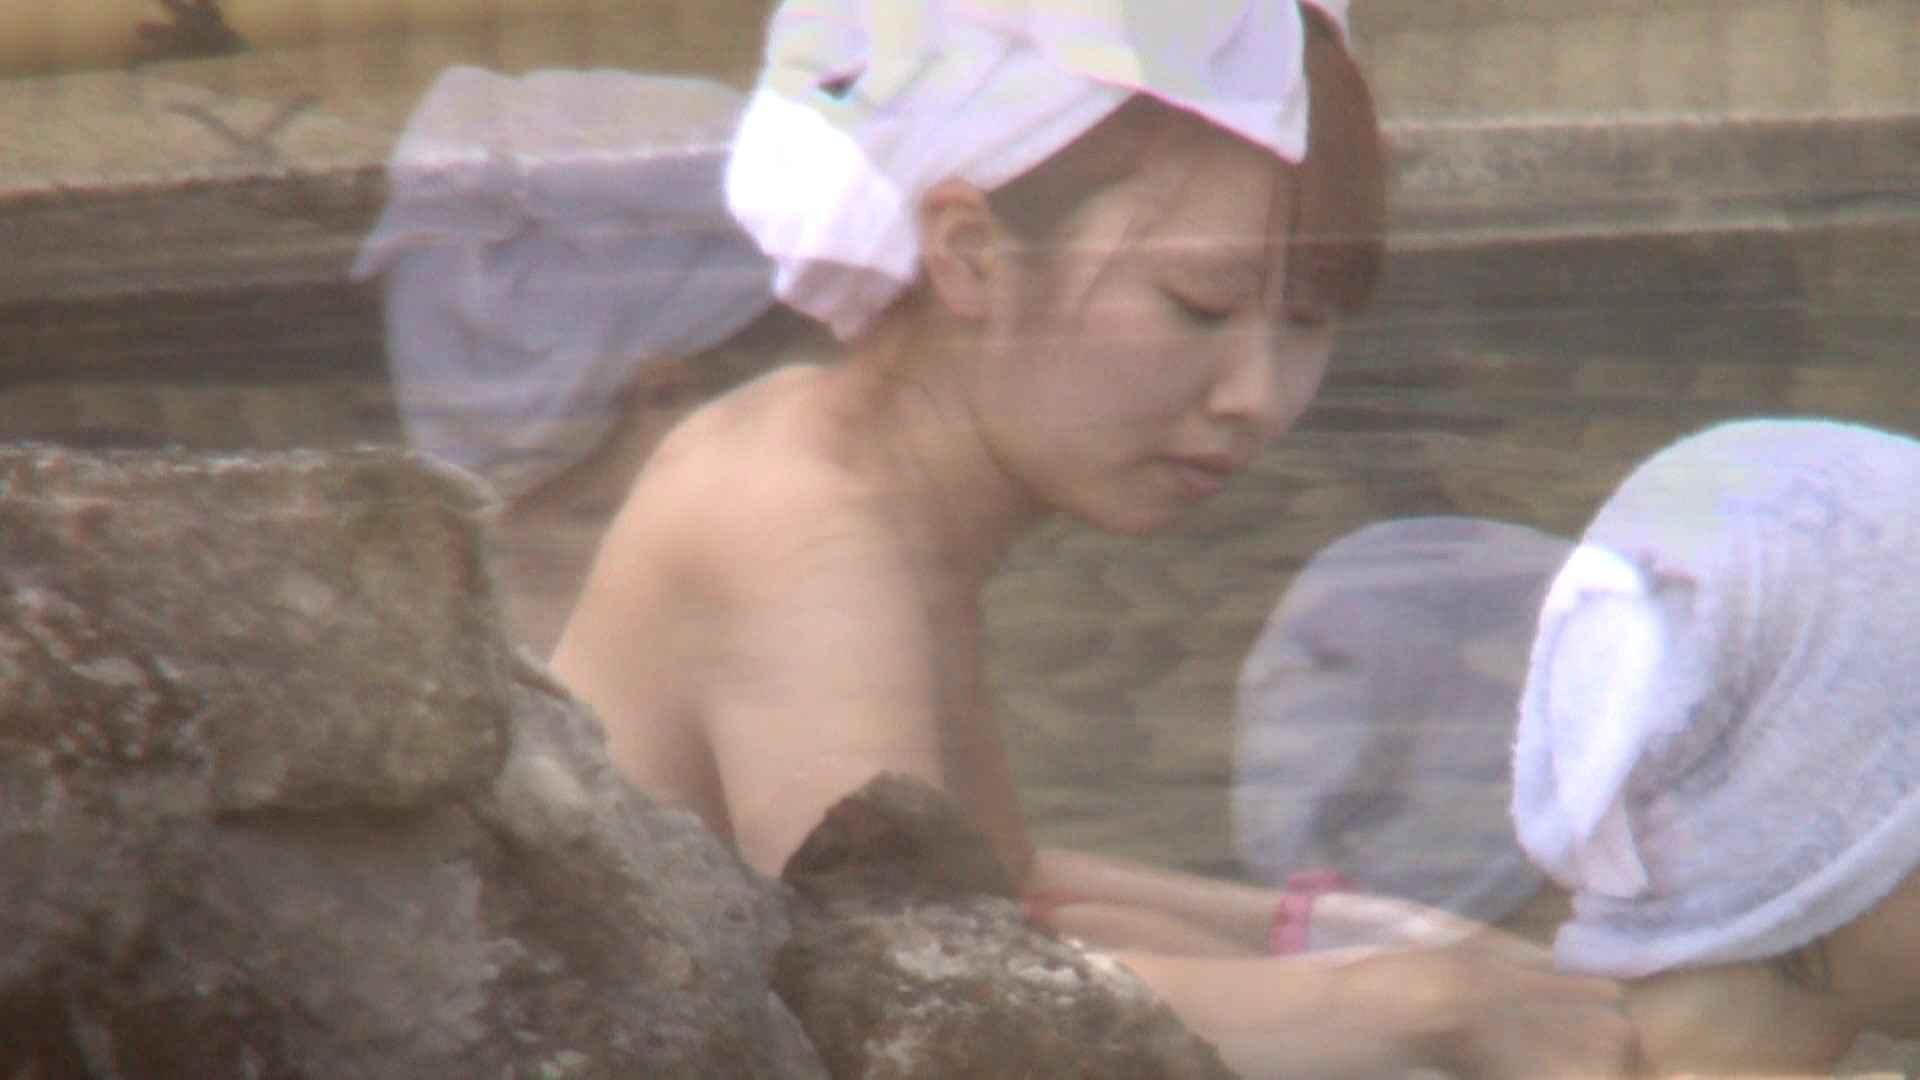 Aquaな露天風呂Vol.210 露天風呂 ワレメ動画紹介 83連発 5